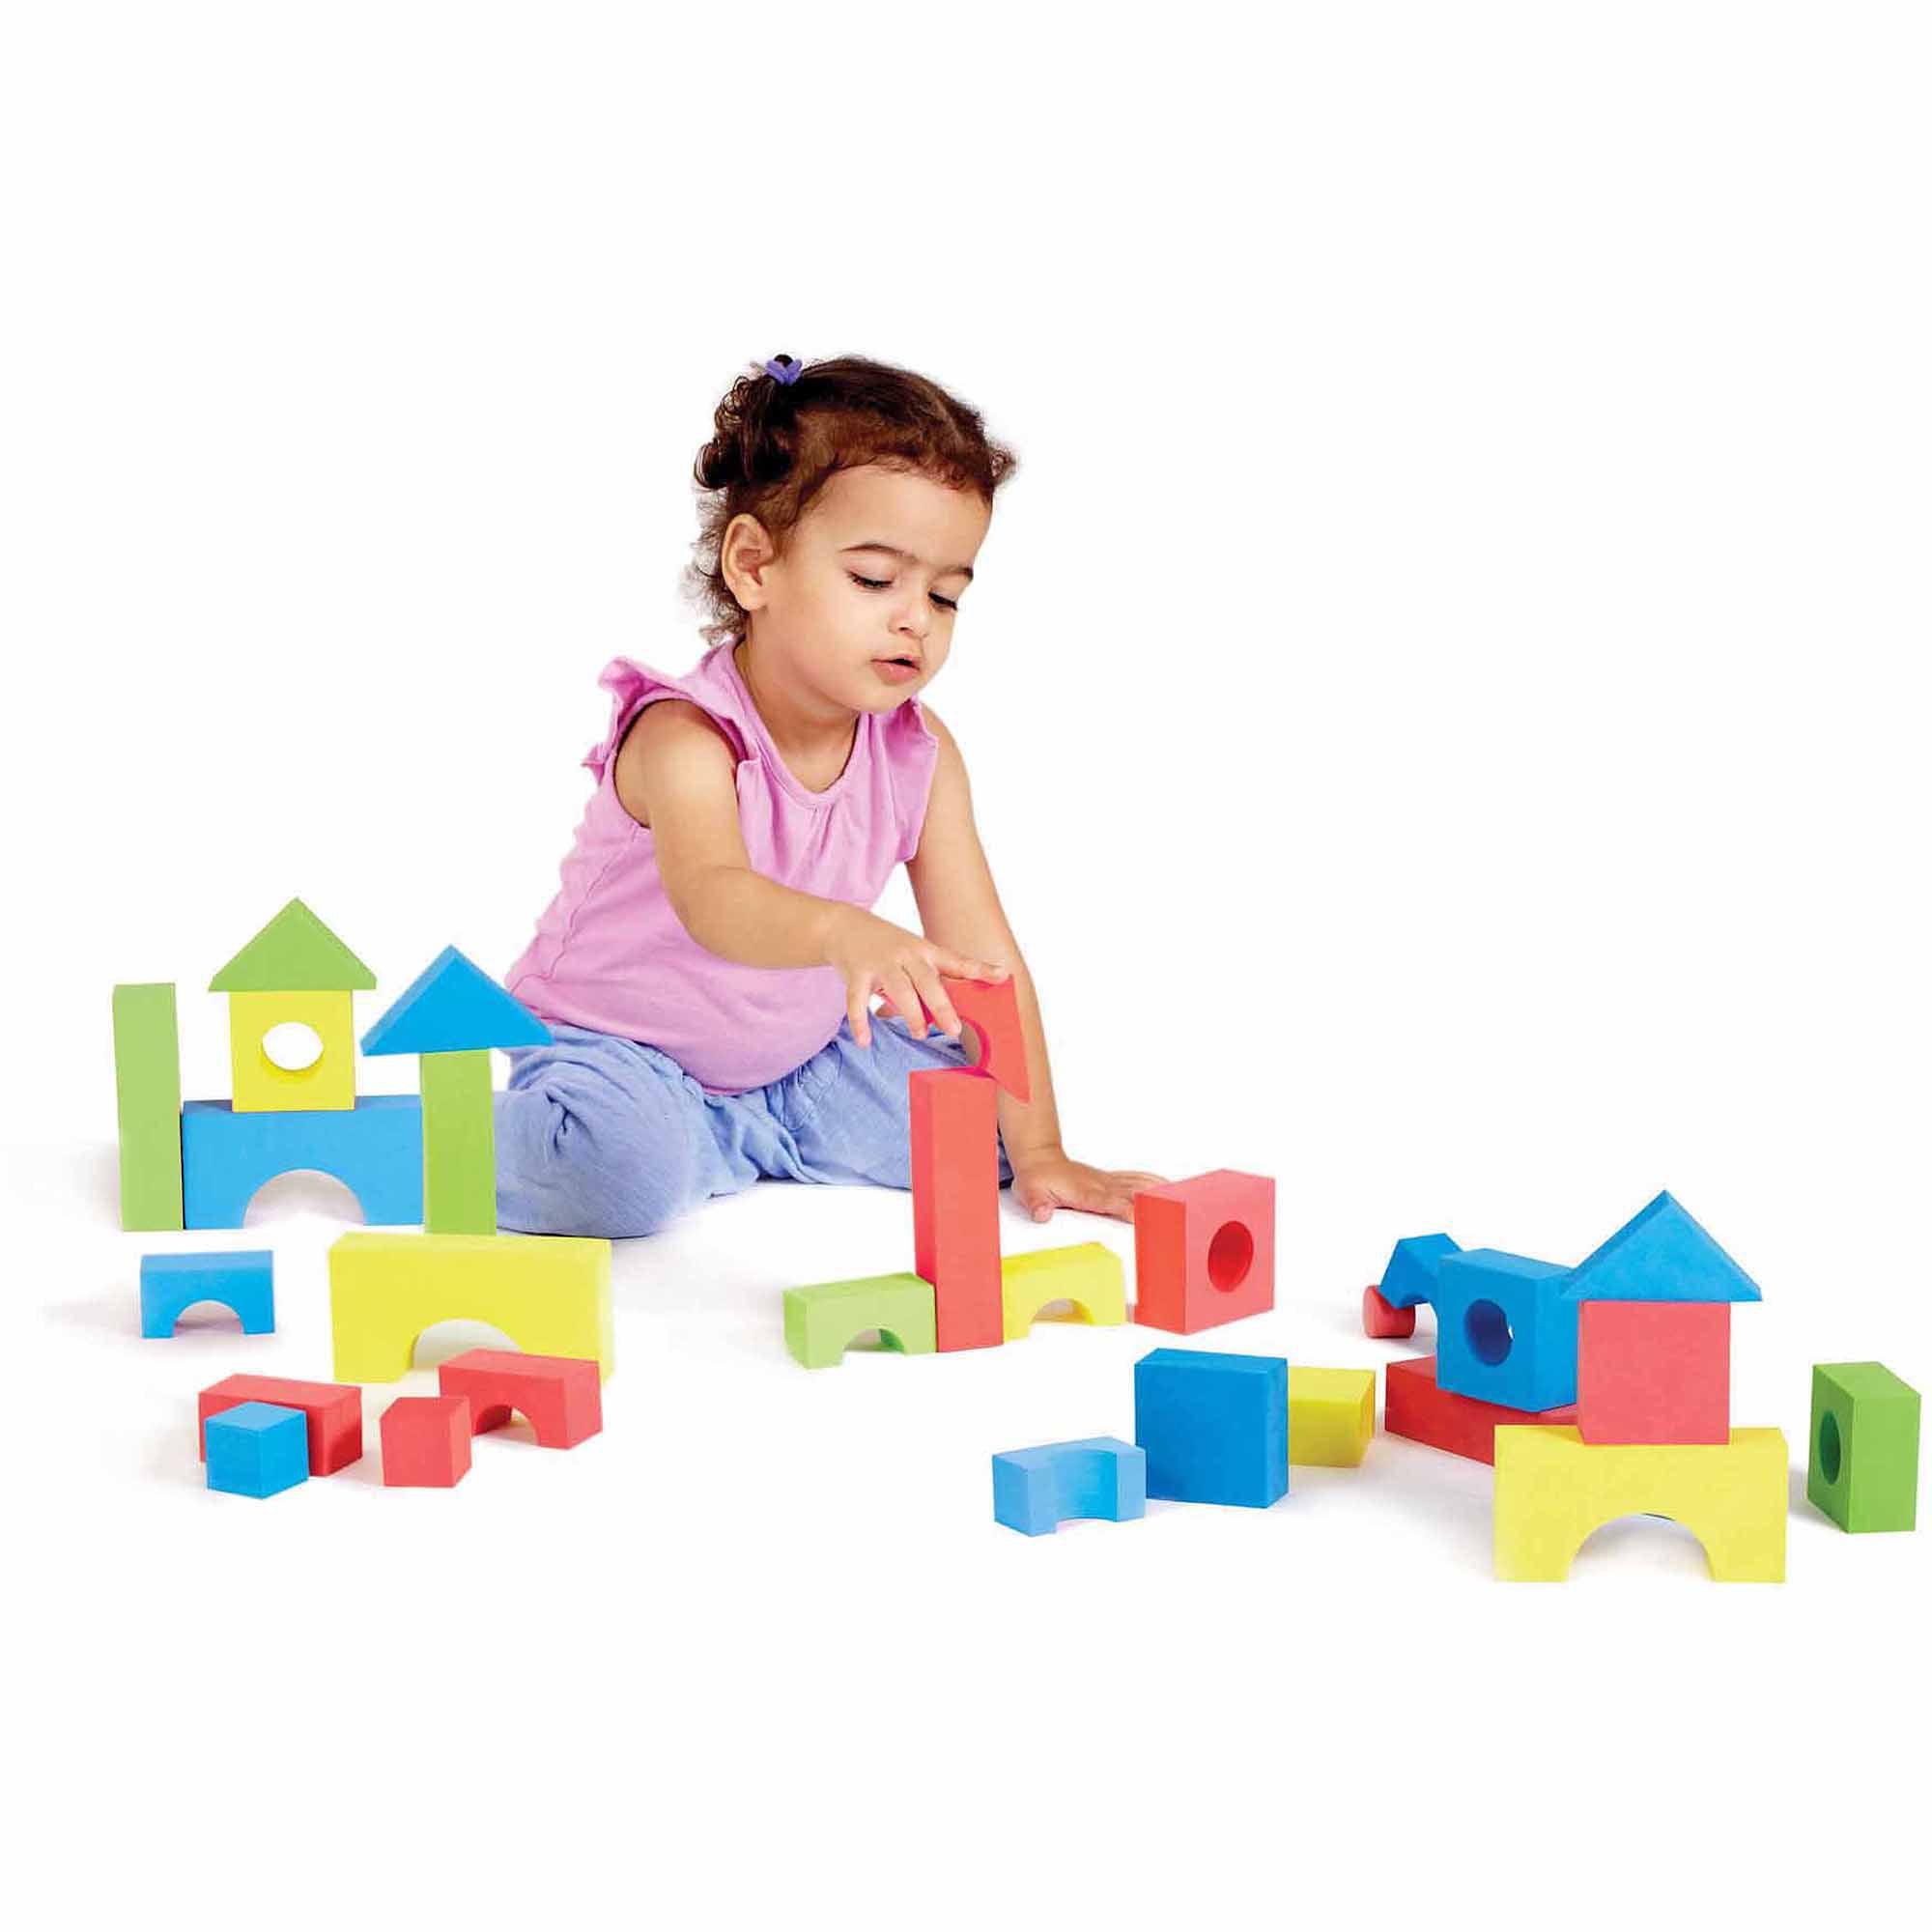 Educolor Blocks, 80 Pieces